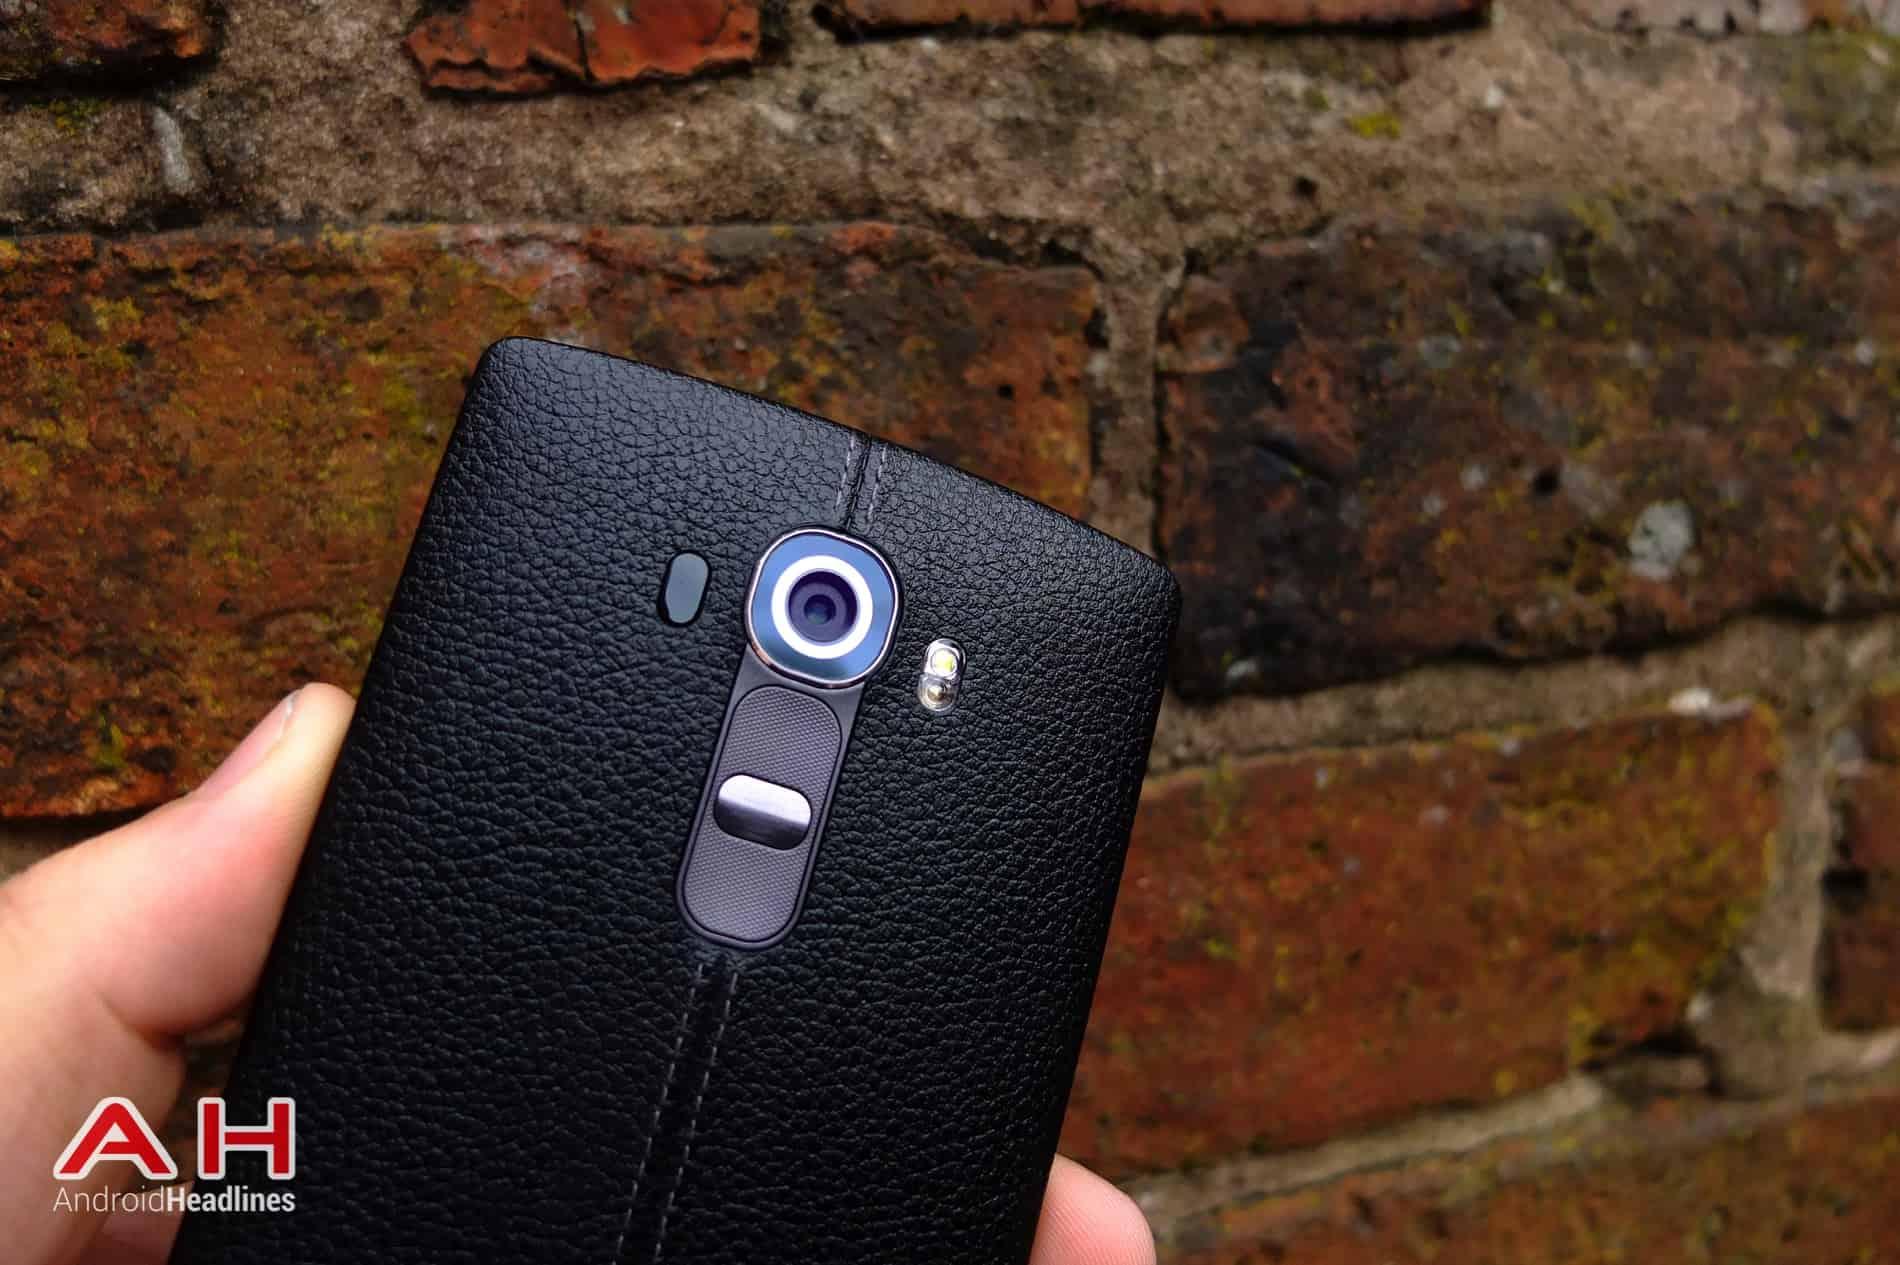 LG G4 BlackLeather TD AH 17